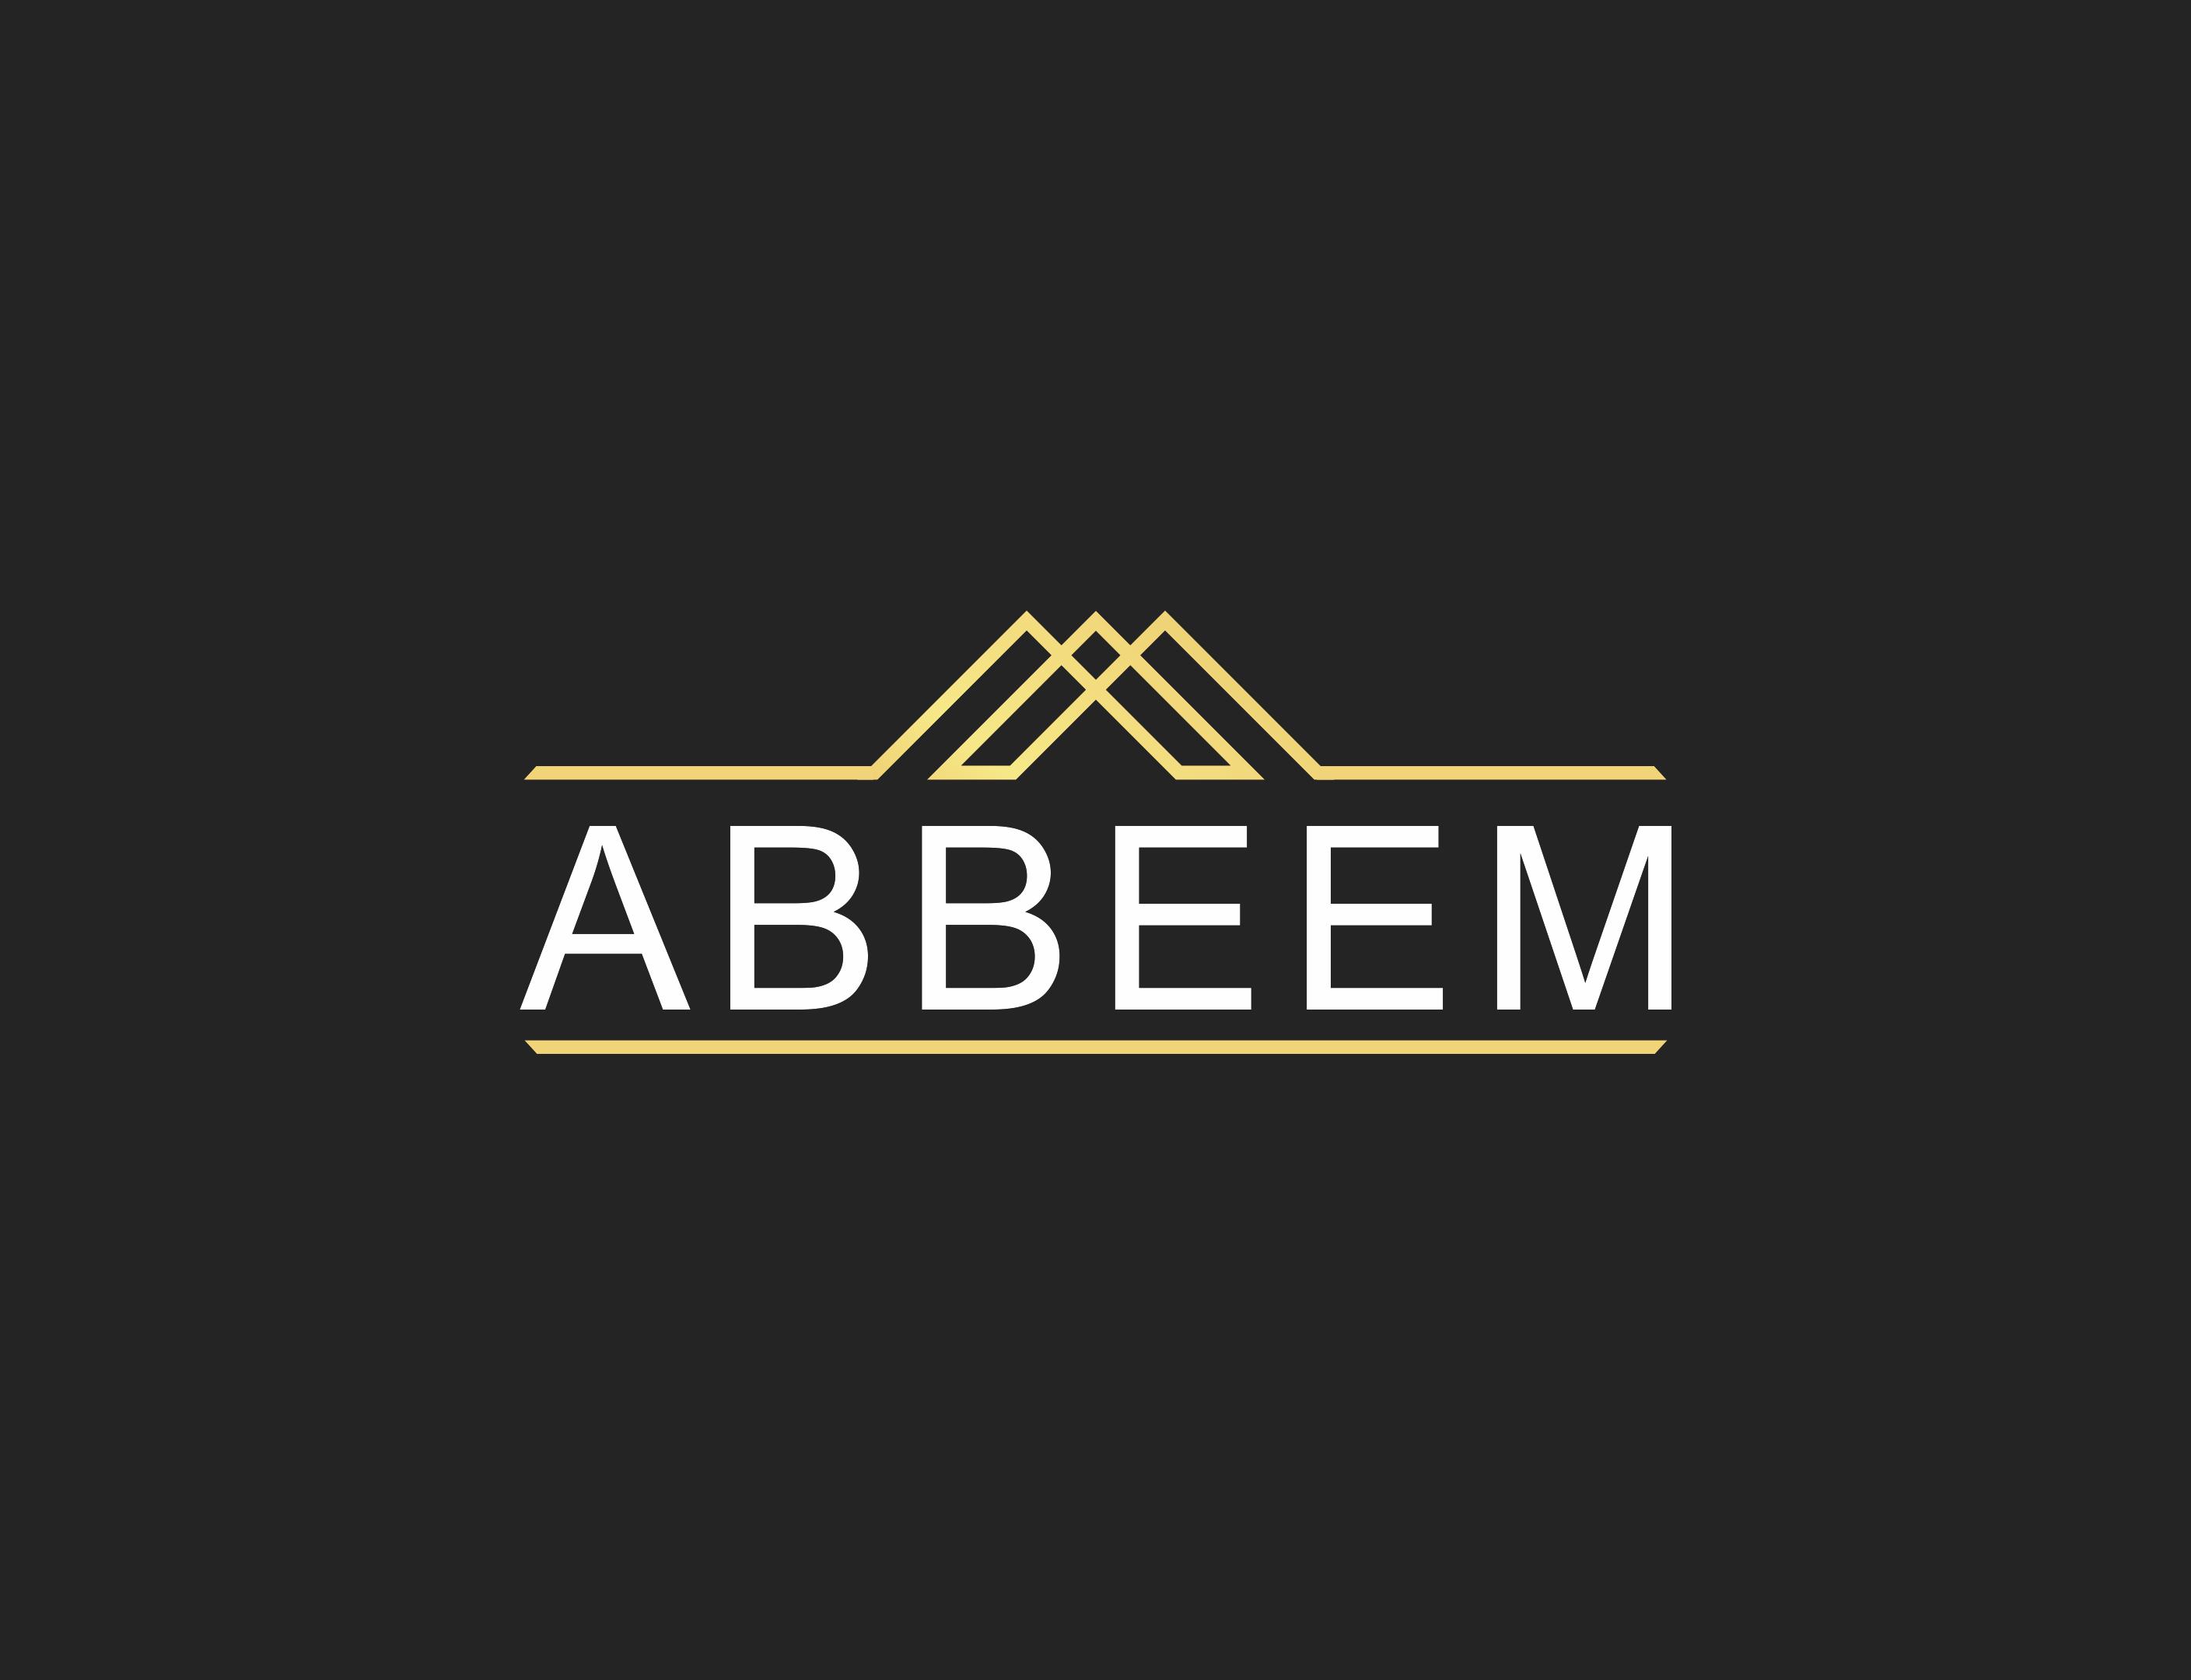 Logo Design by Mokhamad Ngabduloh - Entry No. 120 in the Logo Design Contest Luxury Logo Design for Abbeem.